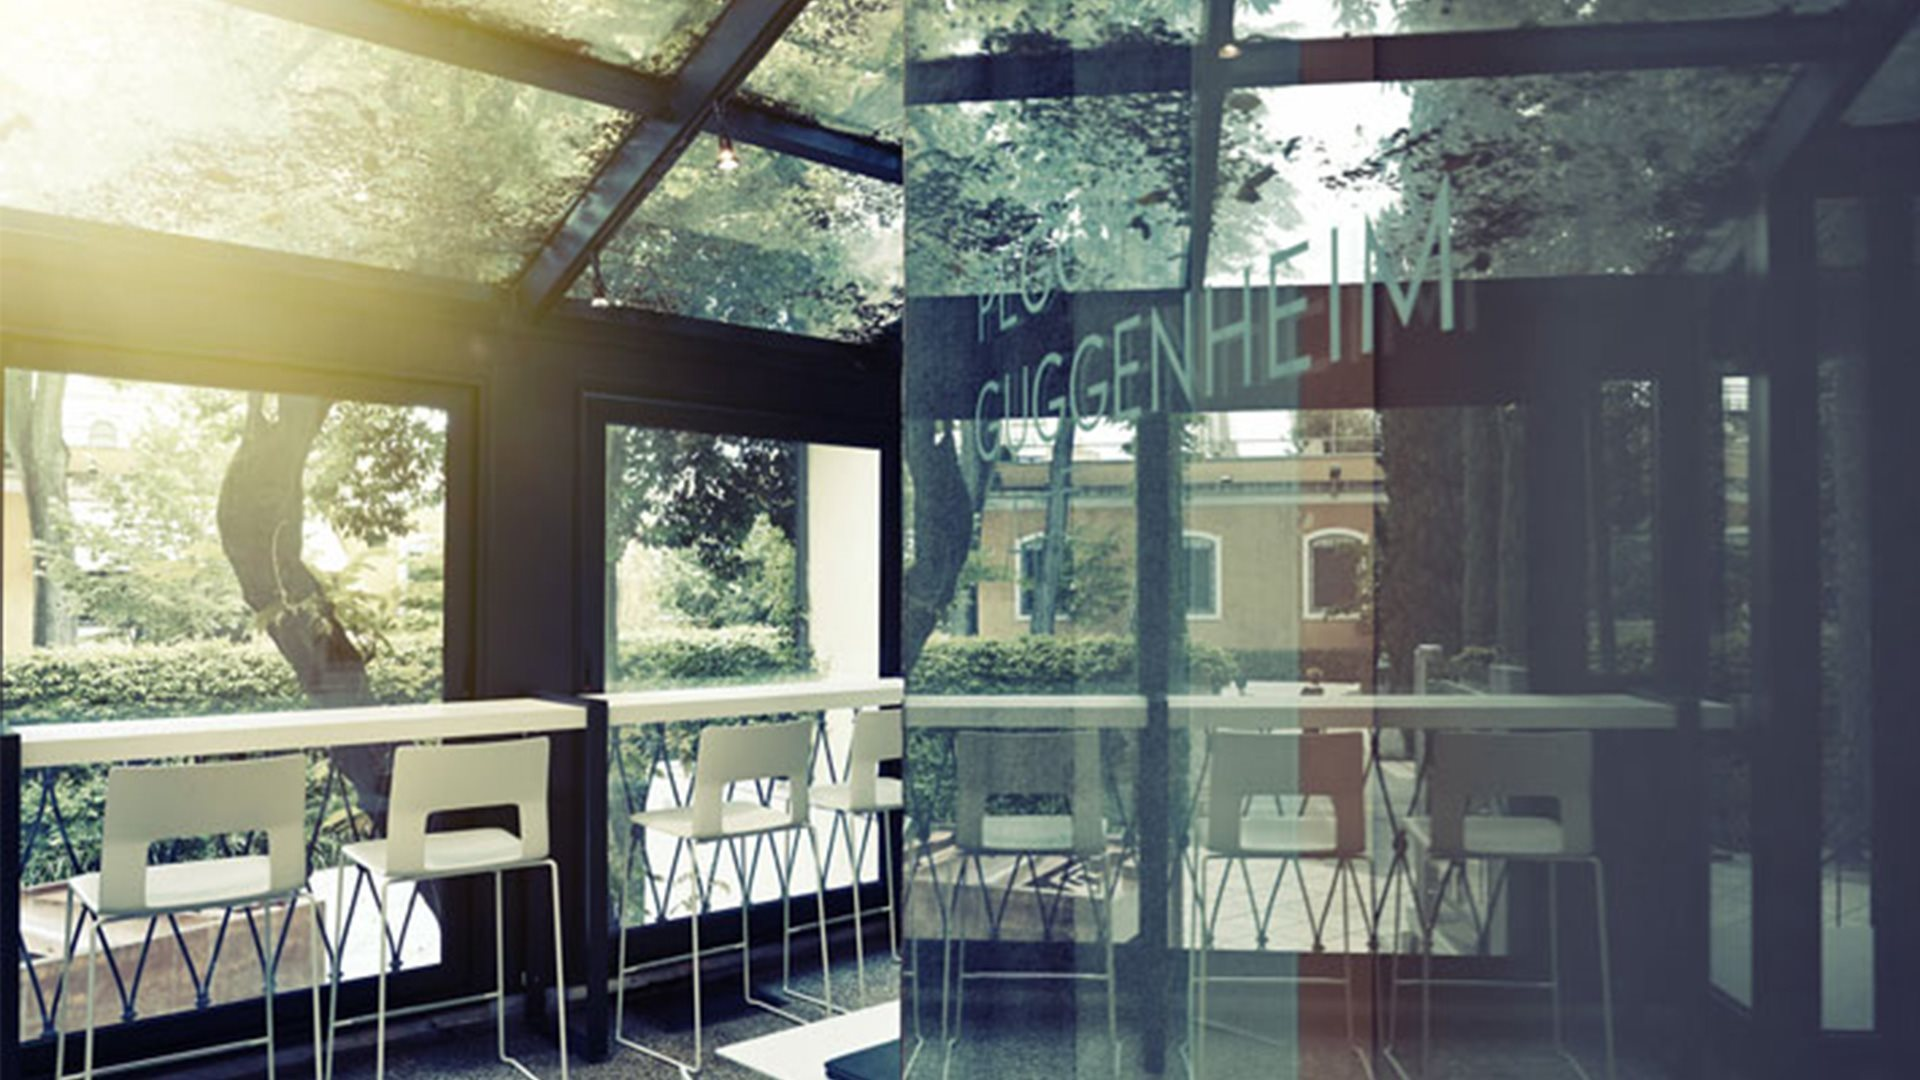 GALLERY_PeggyGuggenheim_cafe